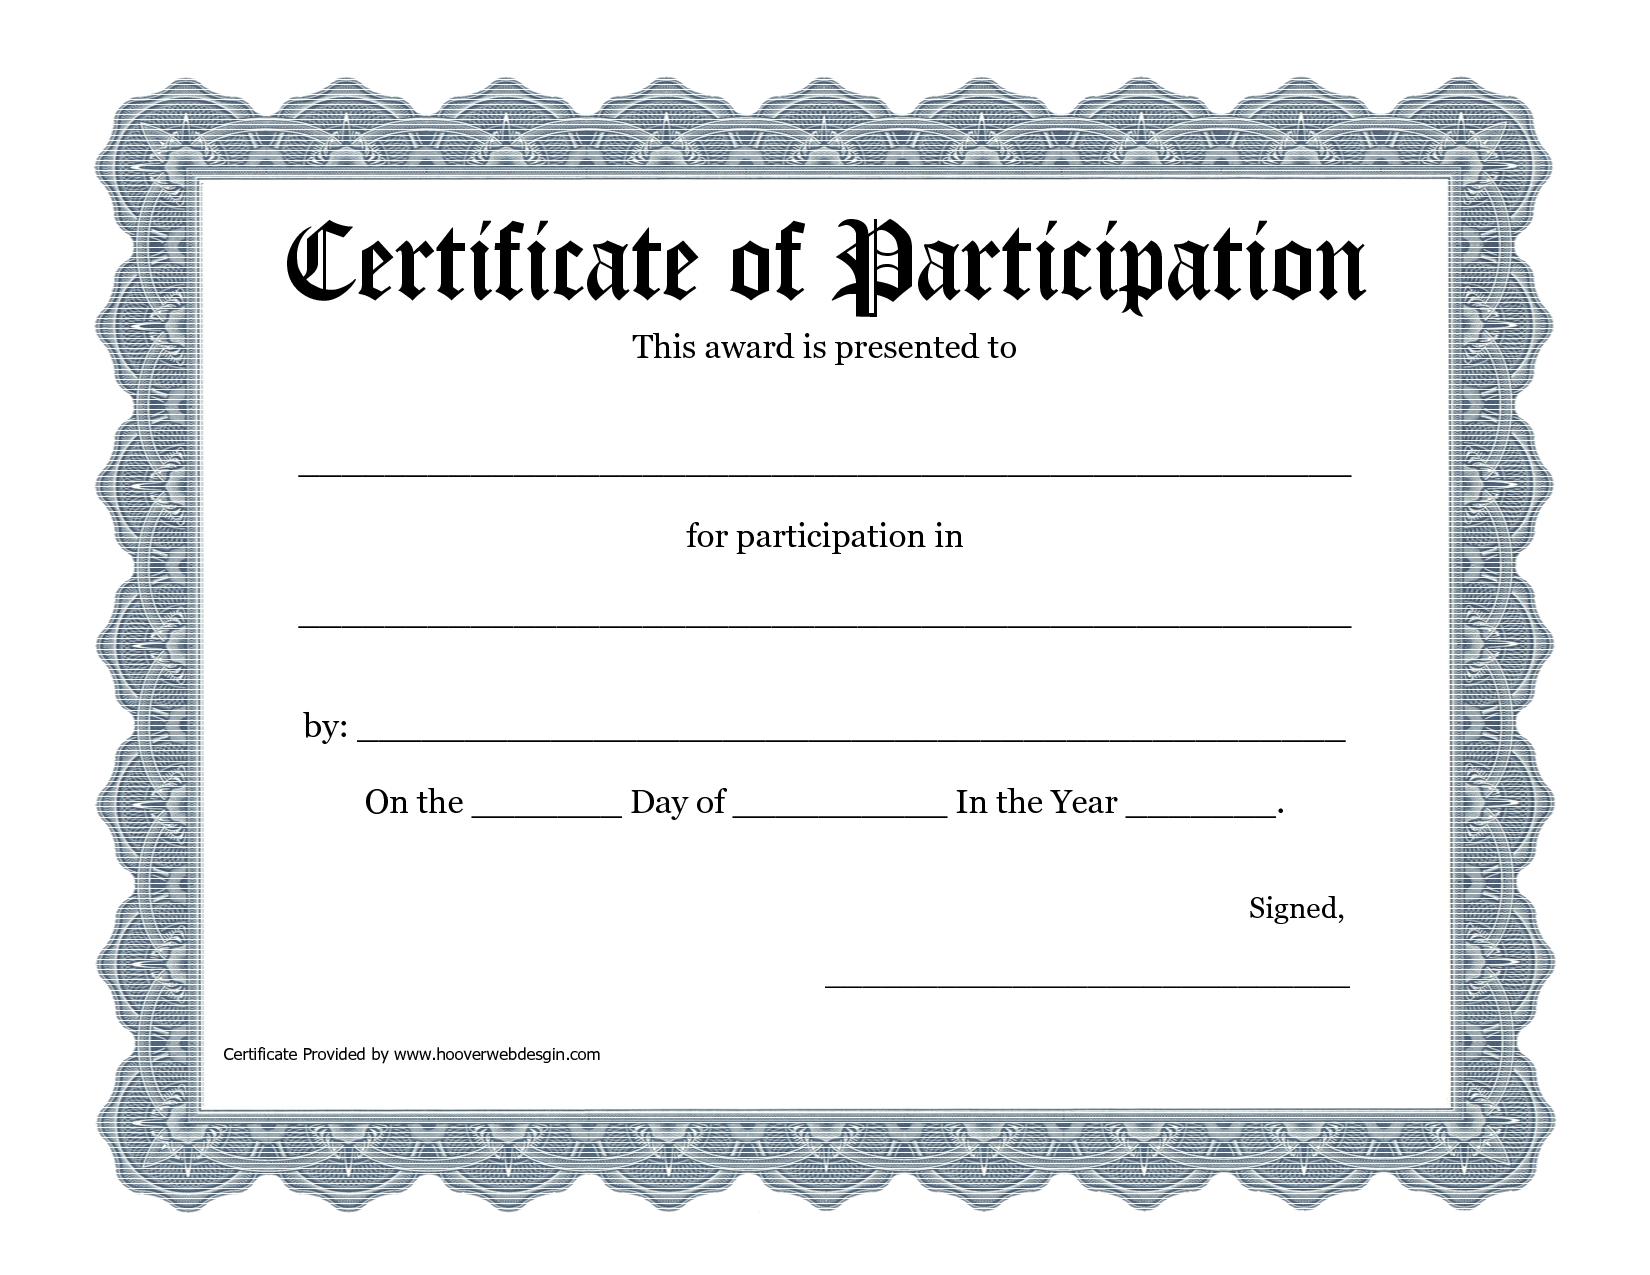 Free Printable Award Certificate Template - Bing Images | 2016 Art - Free Printable Student Award Certificate Template